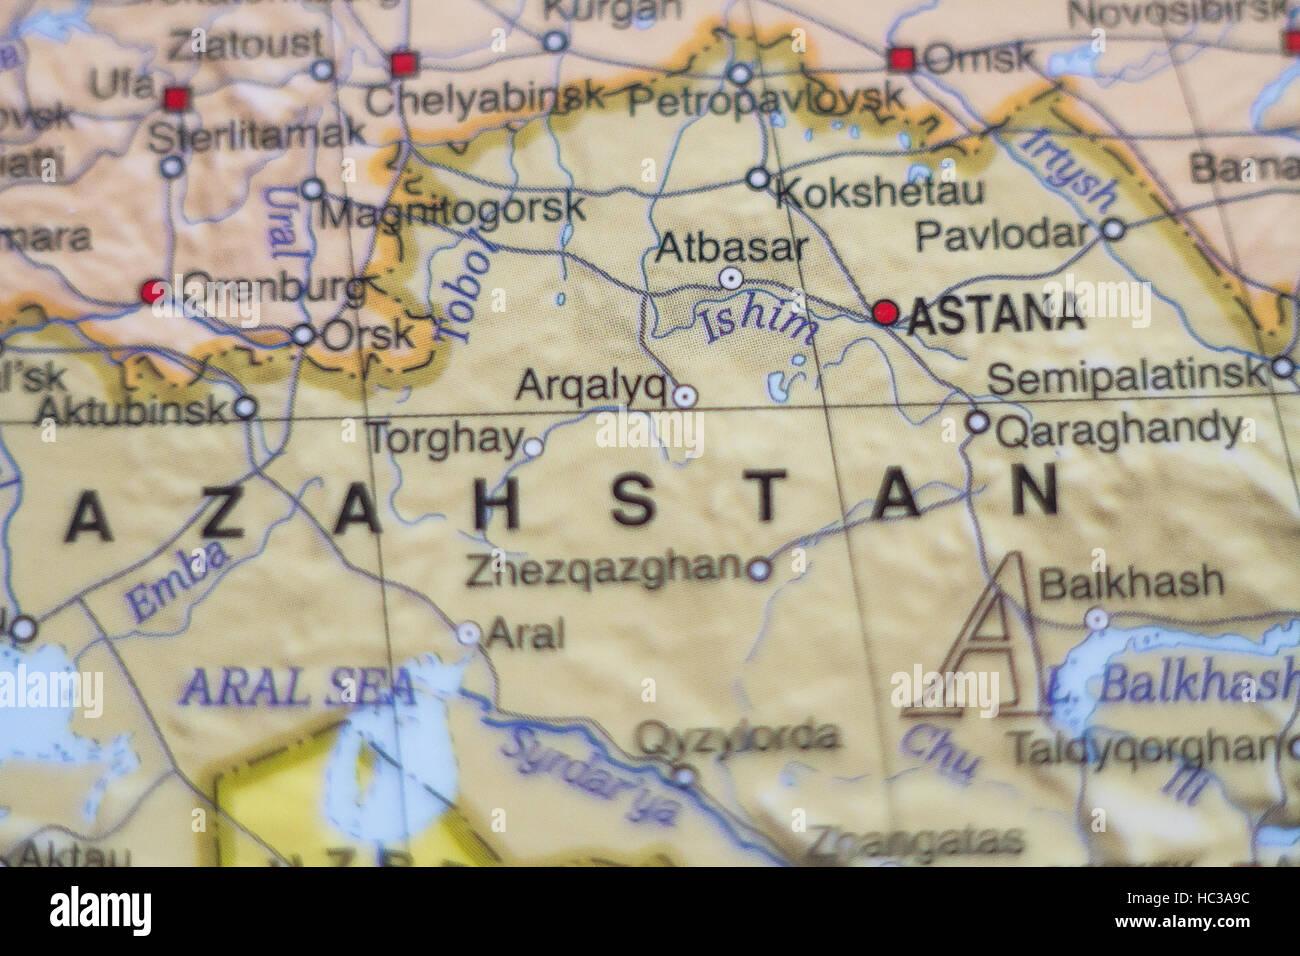 Photo of a map of Kazahstan and the capital Astana Stock Photo